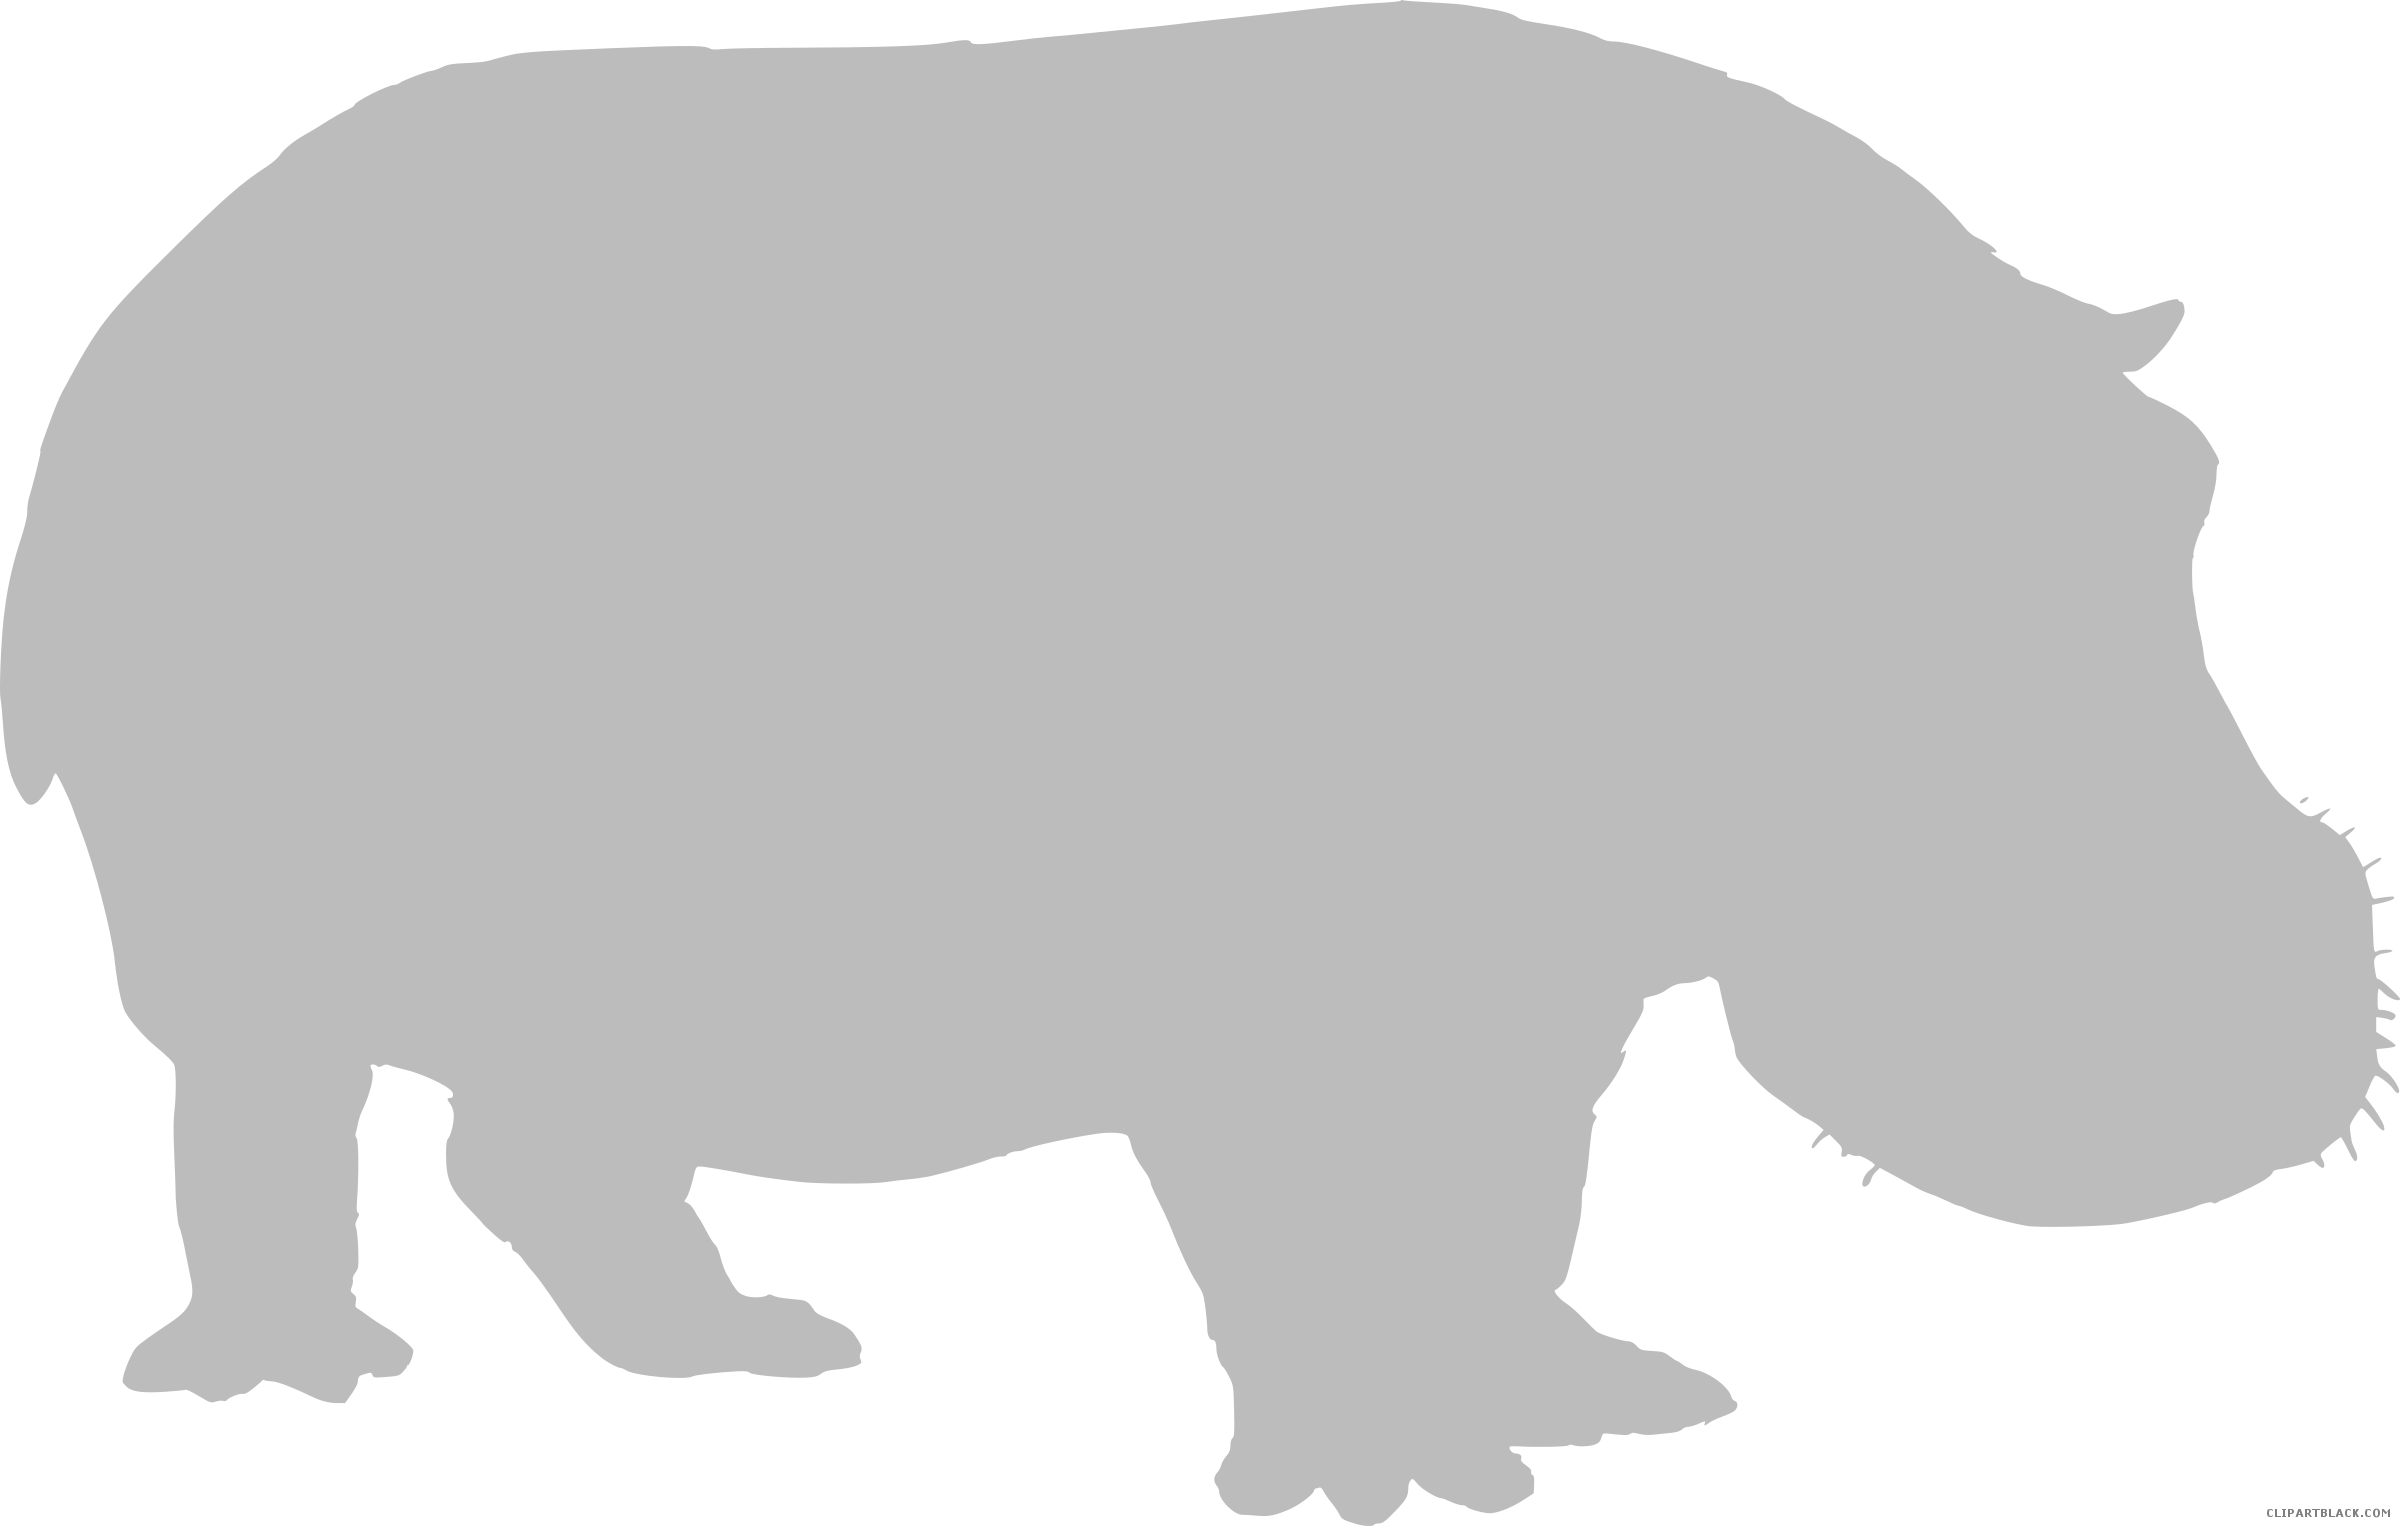 Animal free black white. Hippo clipart grey